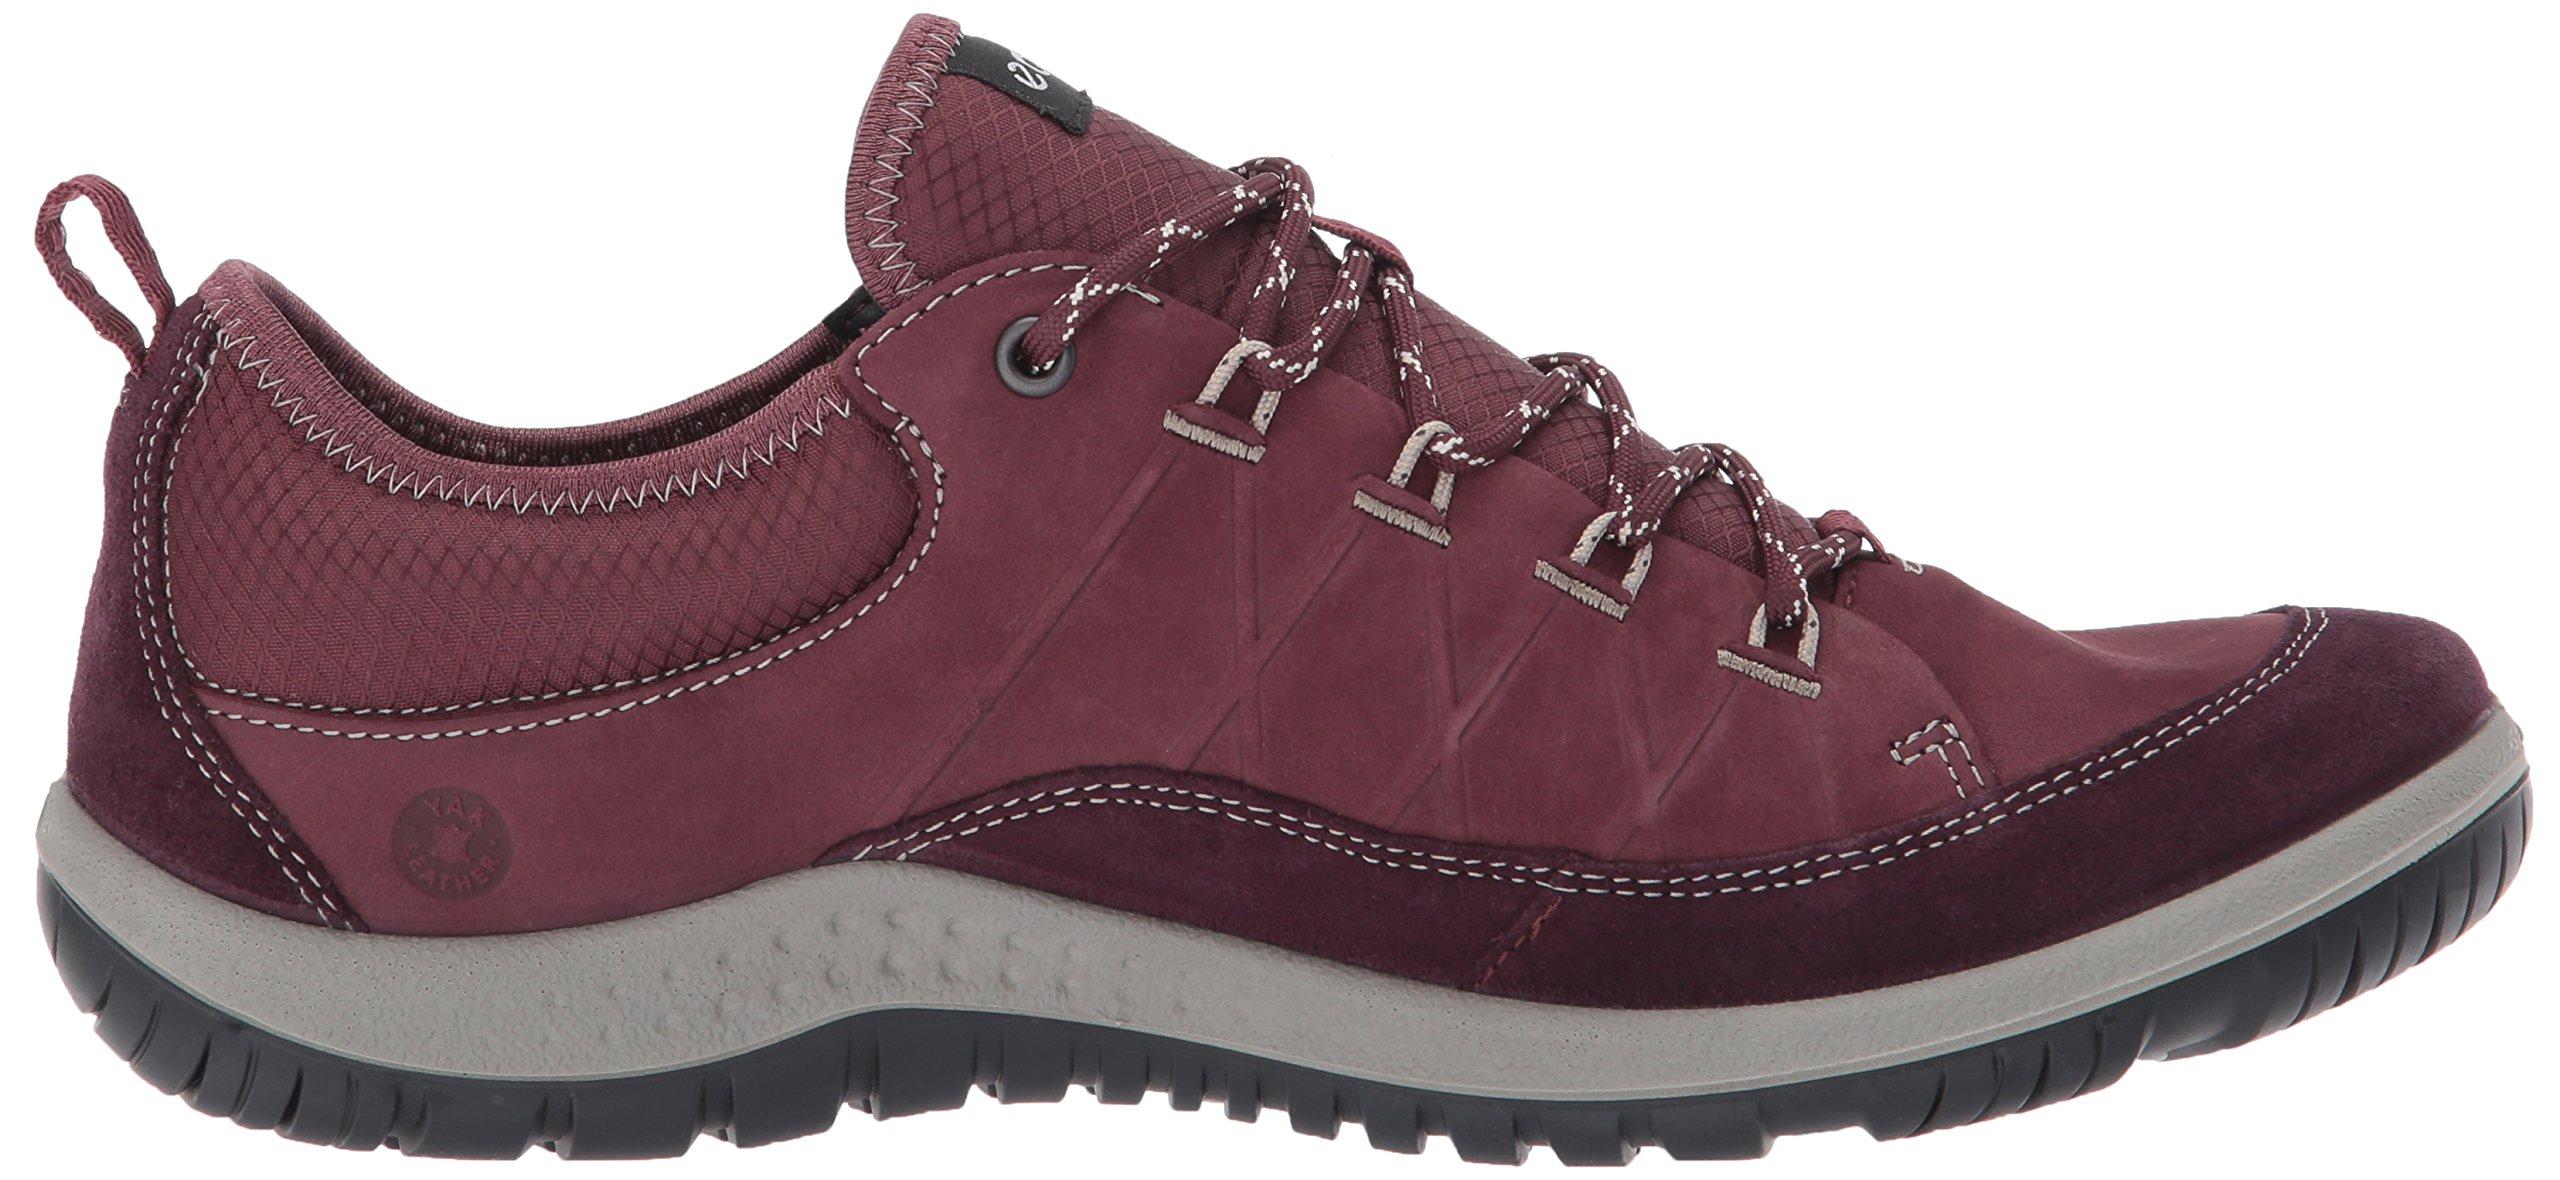 81iG6hv%2B99L - ECCO Women's Aspina Multisport Outdoor Shoes